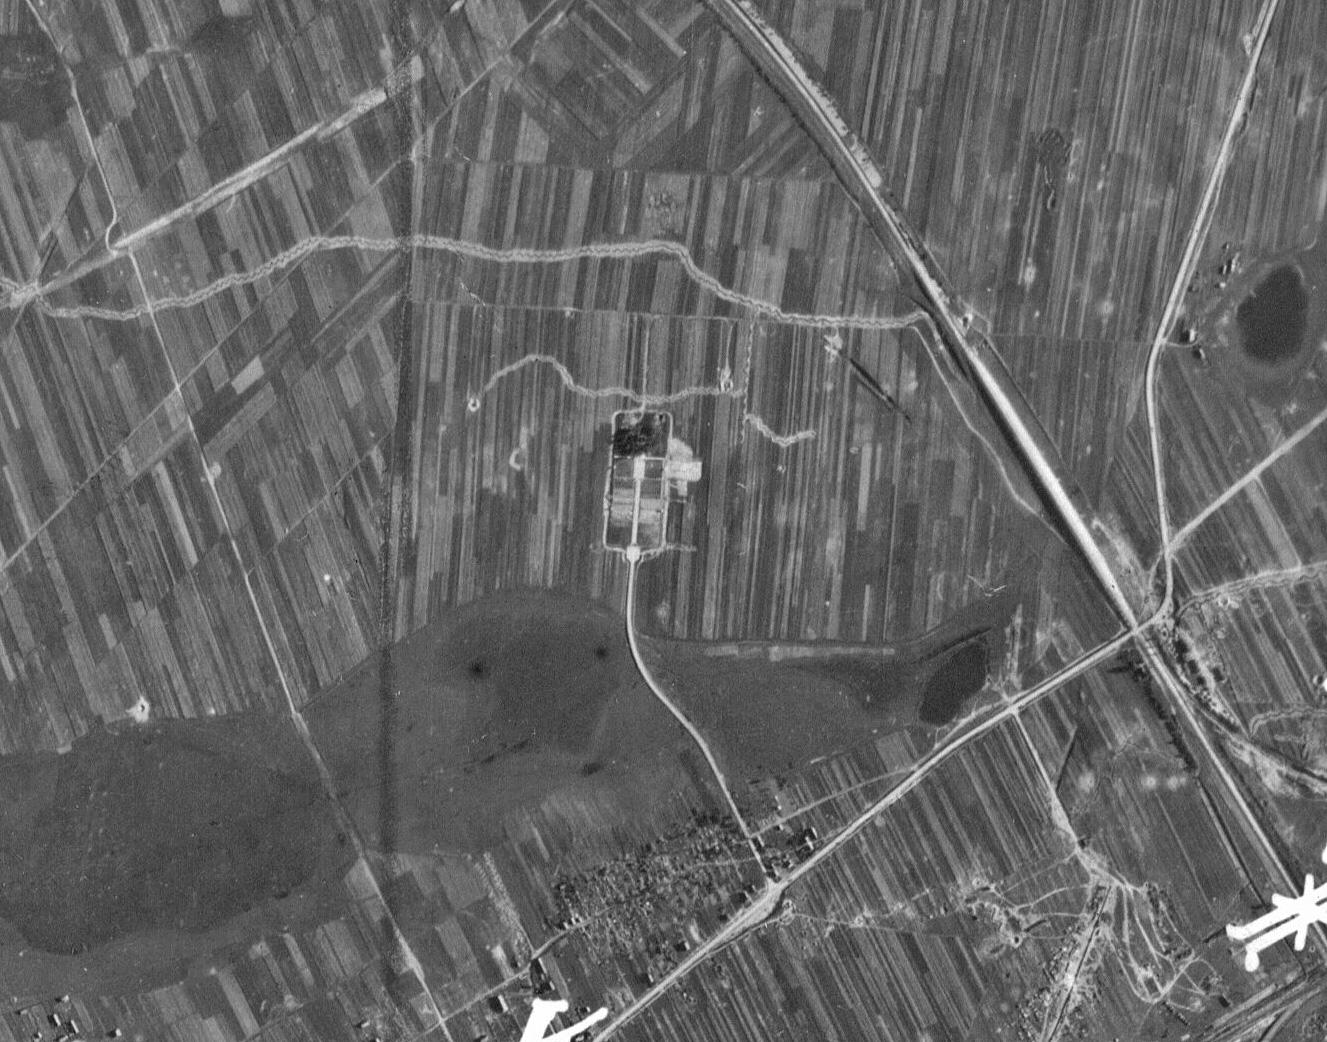 Фрагмент аэрофотосъемки города Барановичи, 1944